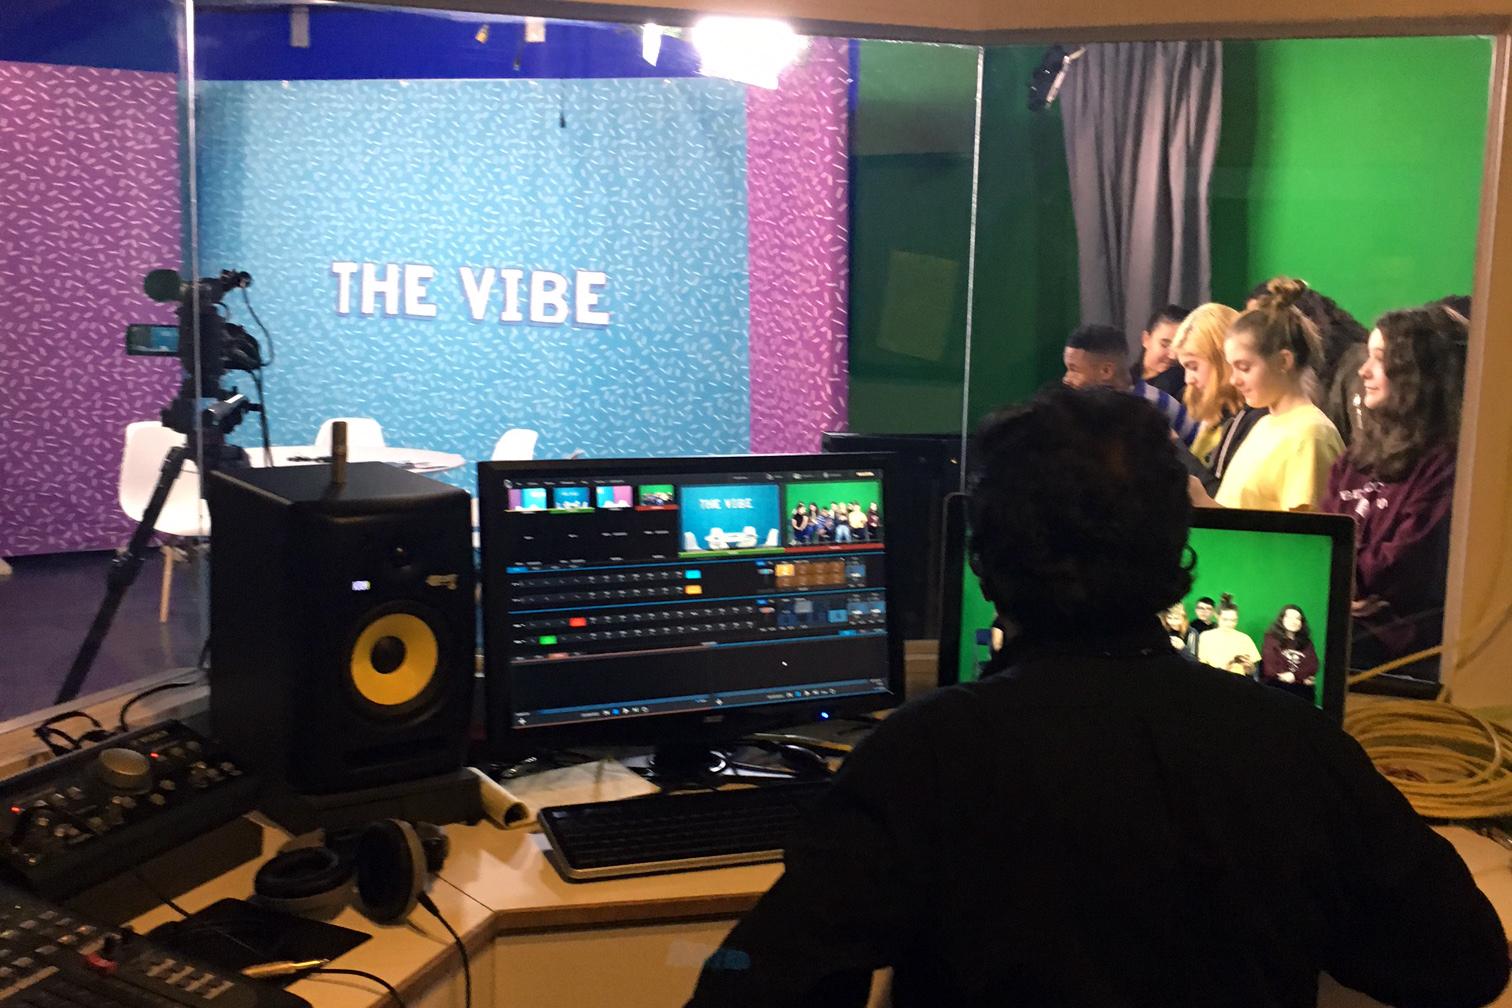 the_vibe.jpg